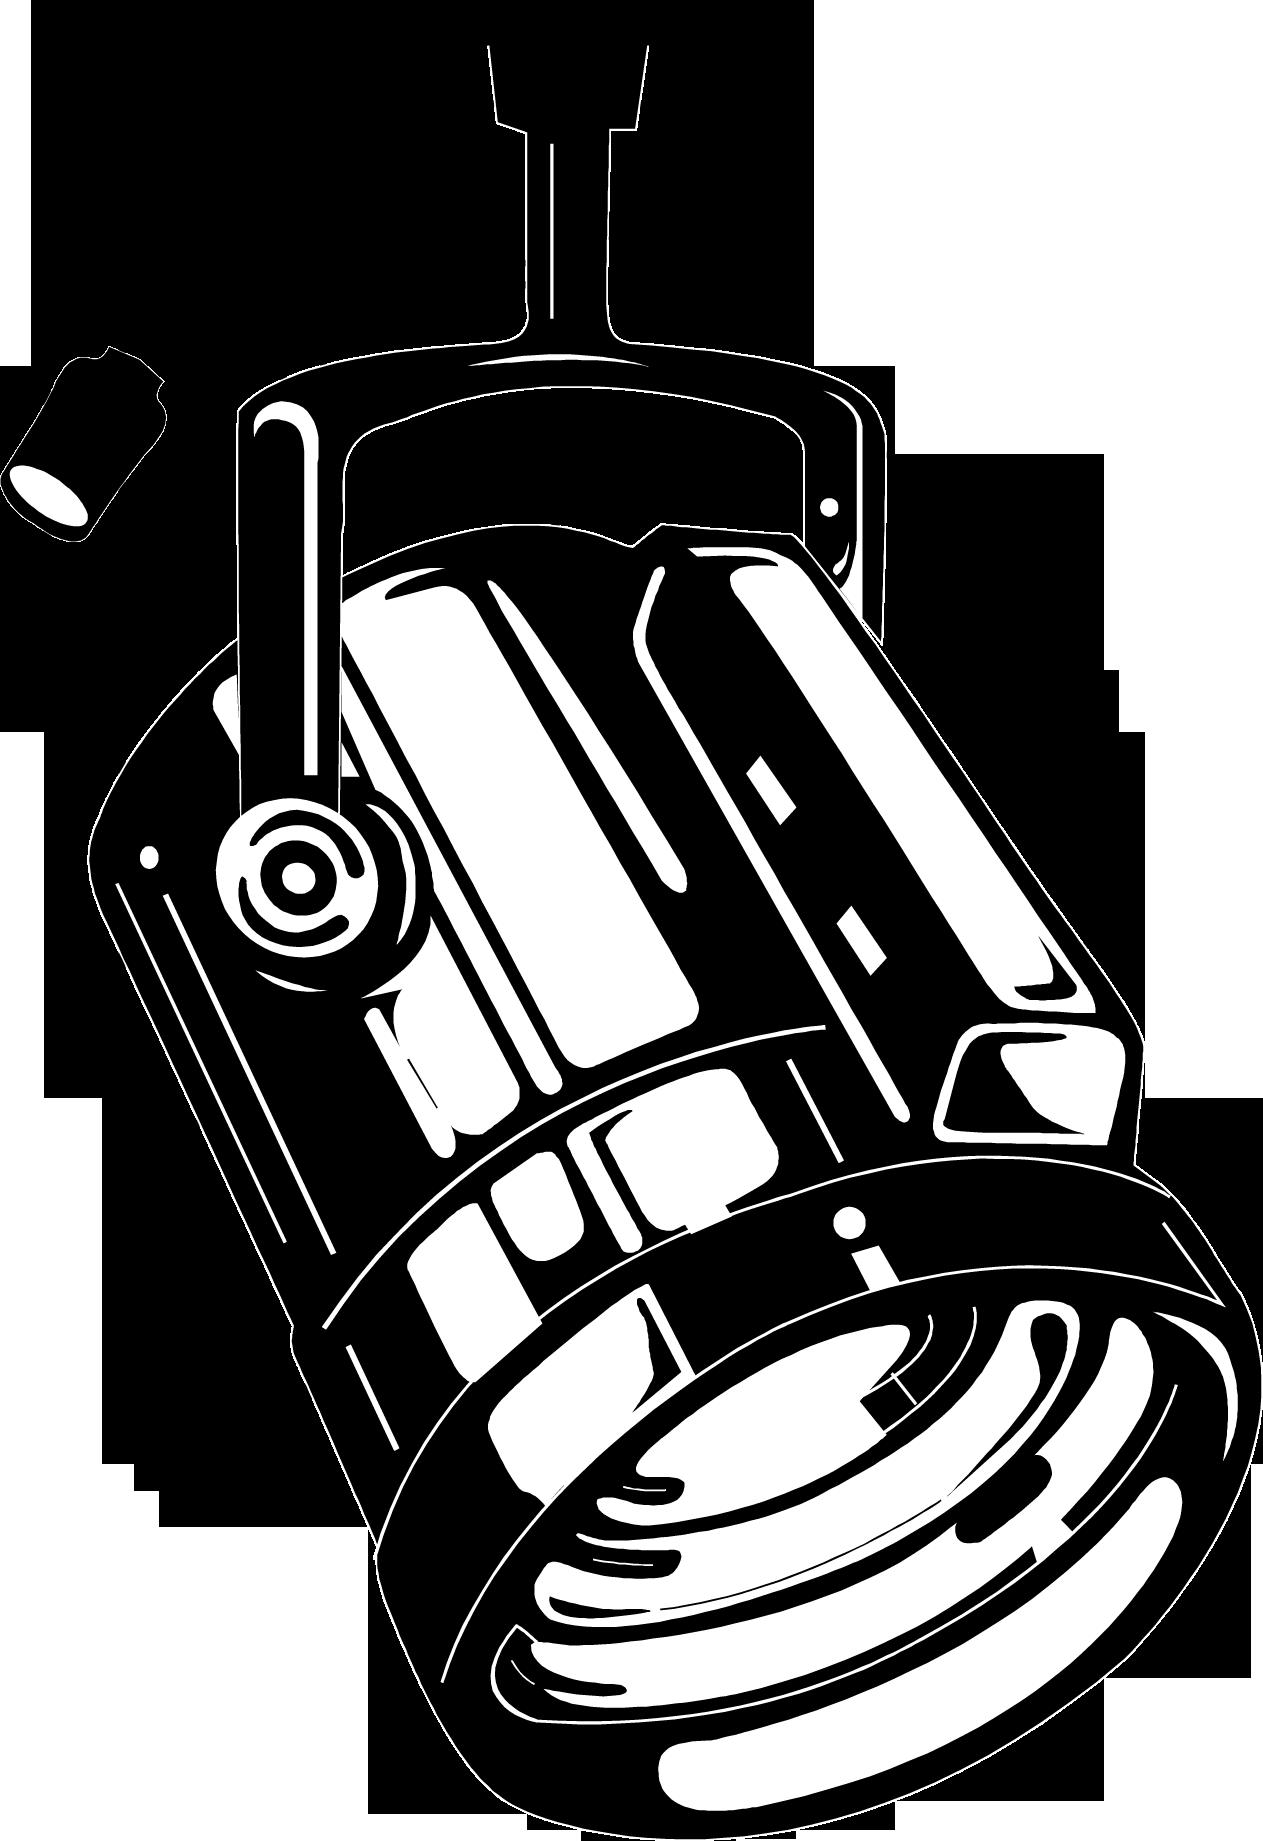 Caveman lighting fire Royalty Free Vector Clip Art illustration  -cart0663-CoolCLIPS.com